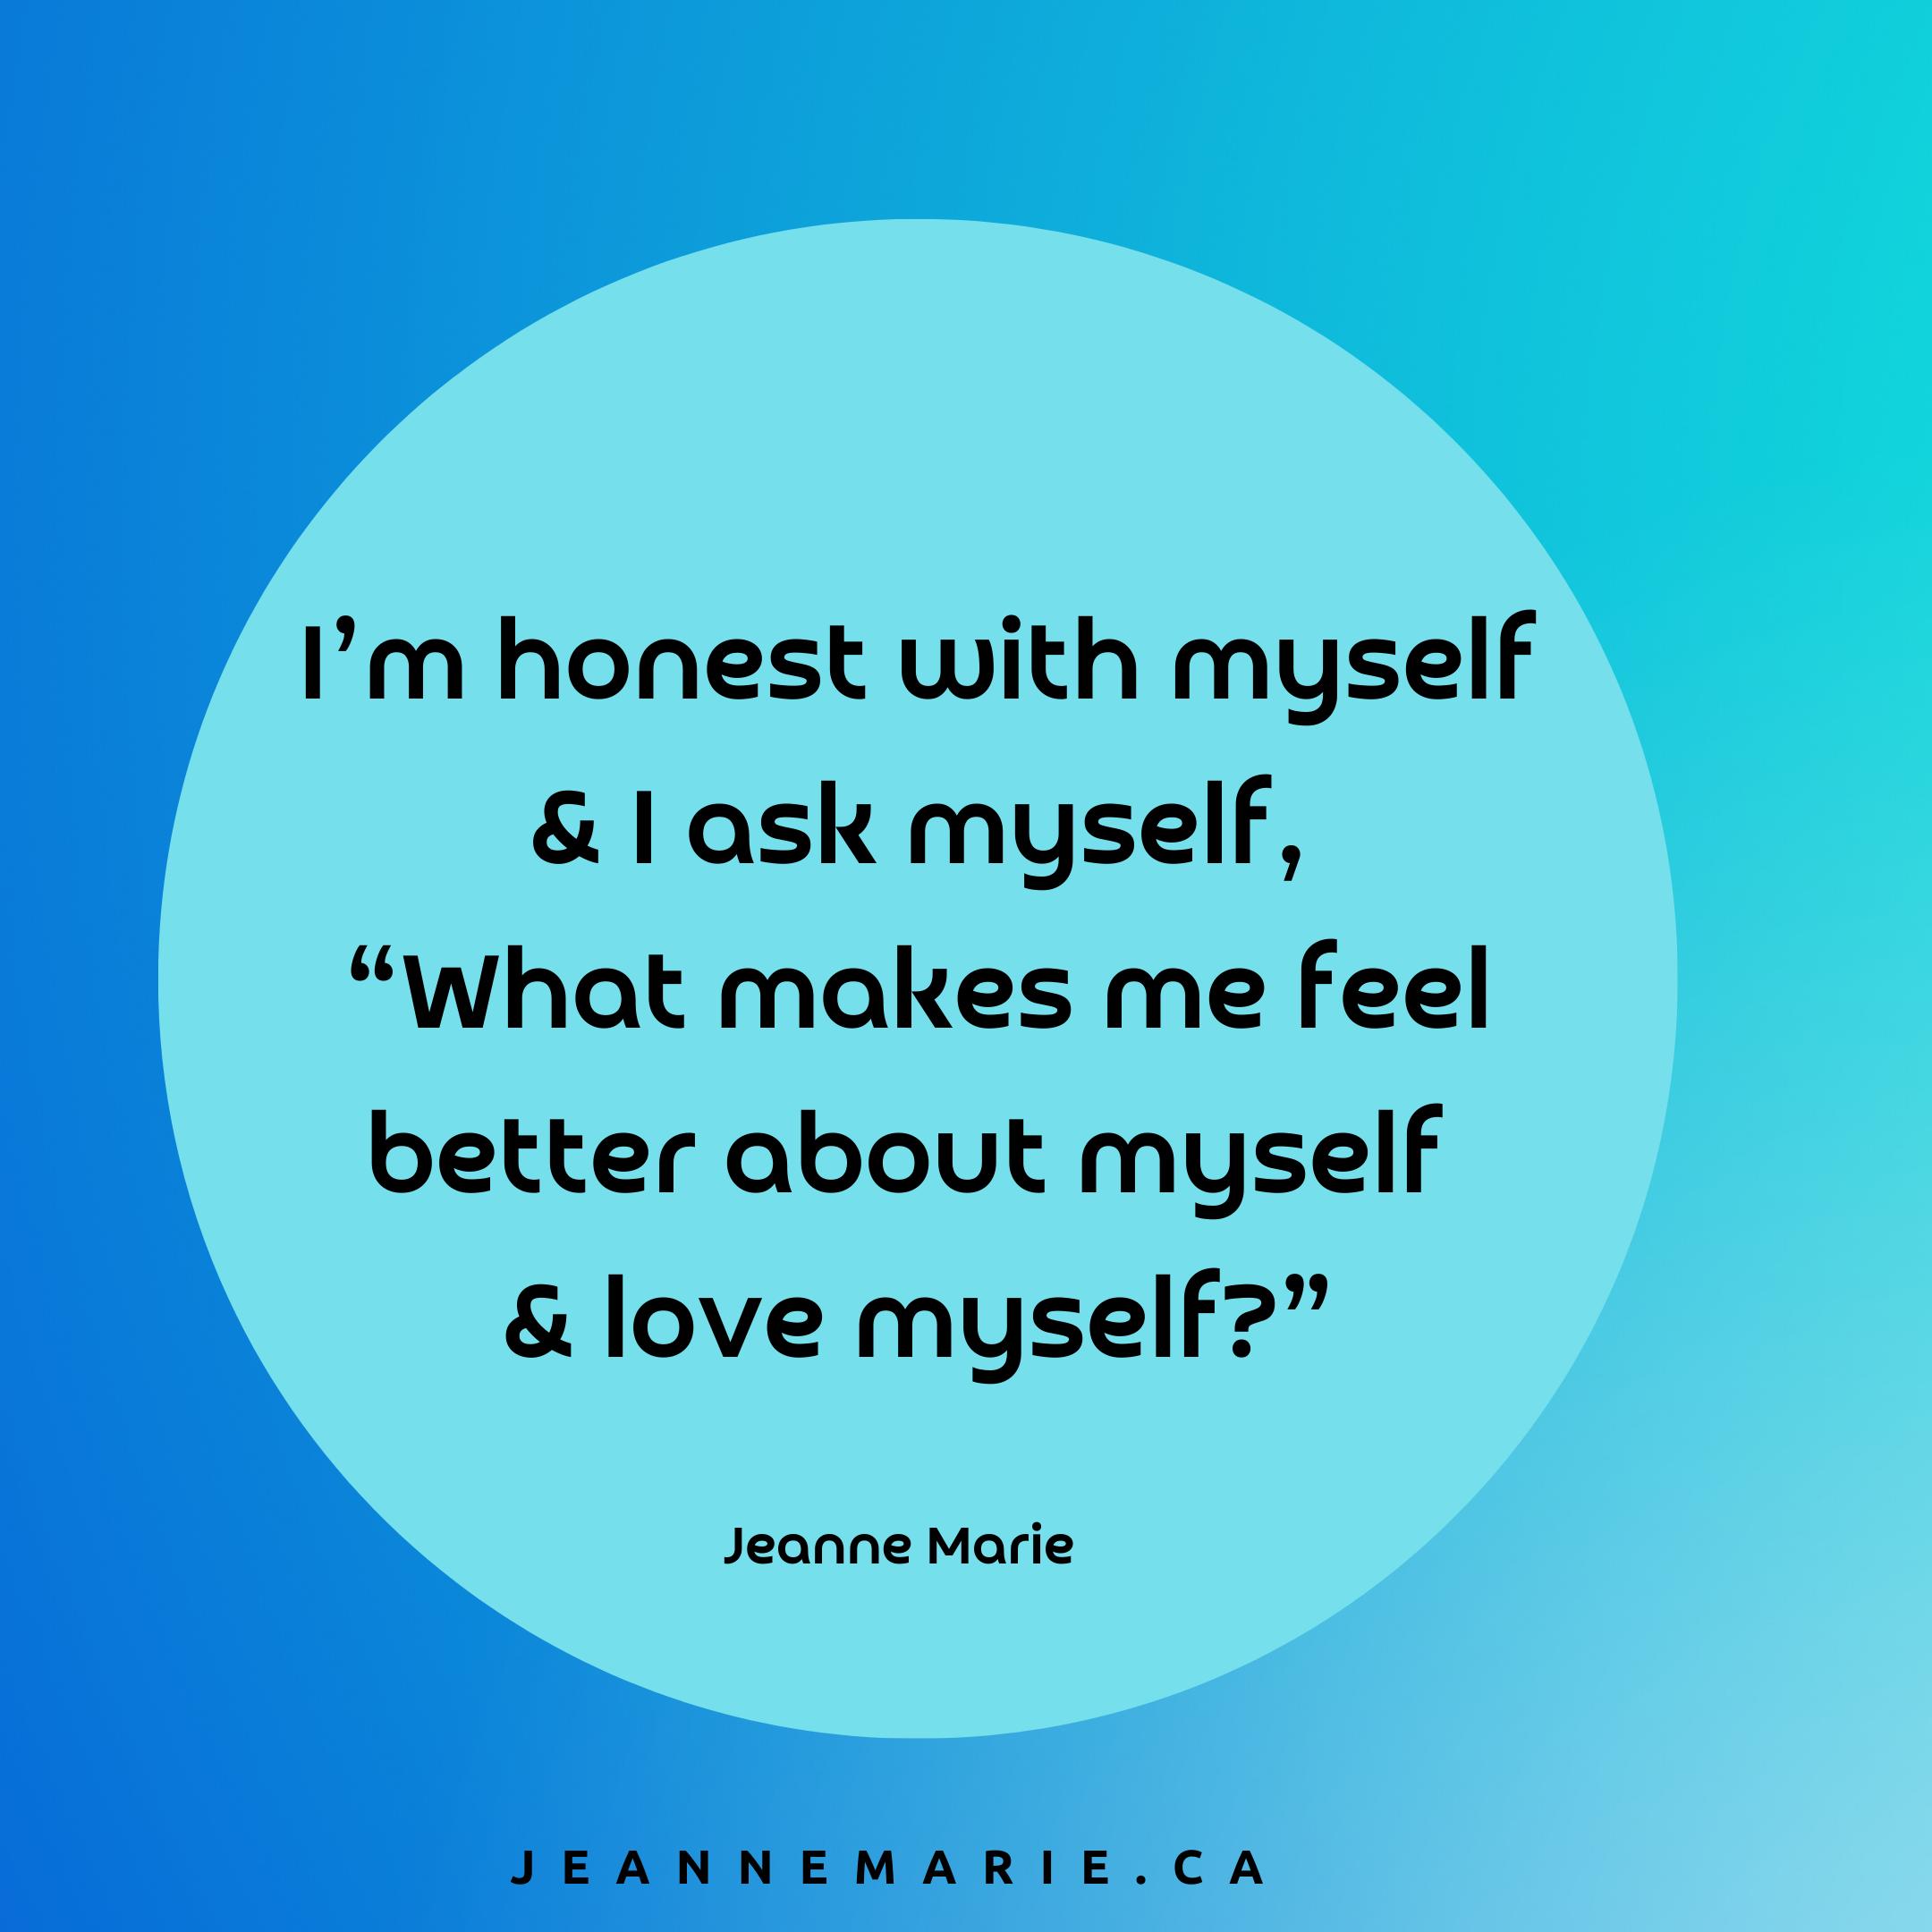 I'm honest with myself and I ask myself